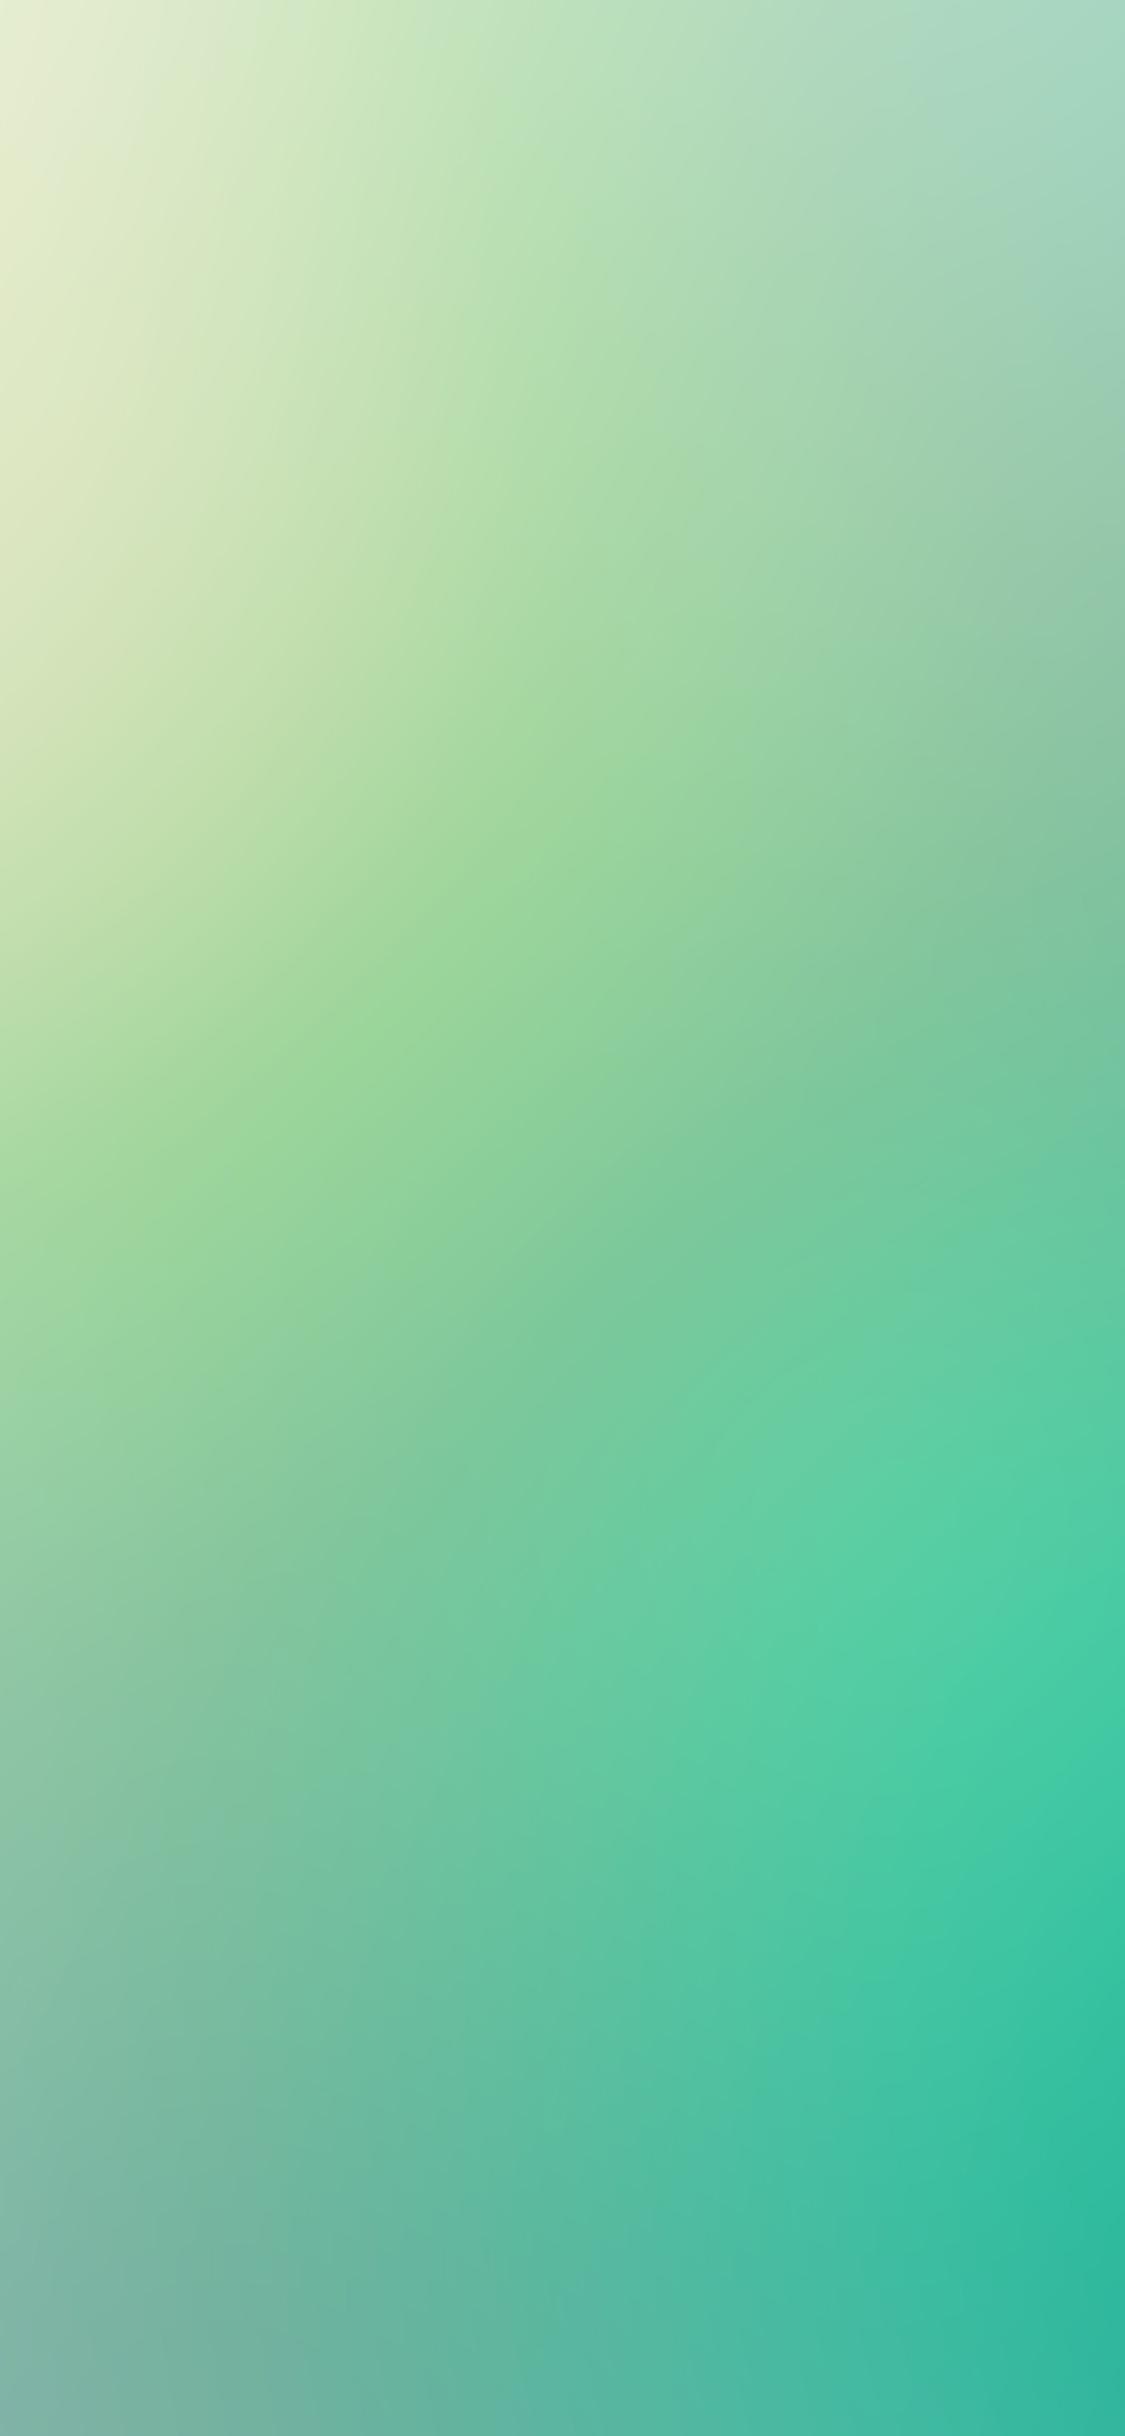 iPhoneXpapers.com-Apple-iPhone-wallpaper-sh83-green-titanic-gradation-blur